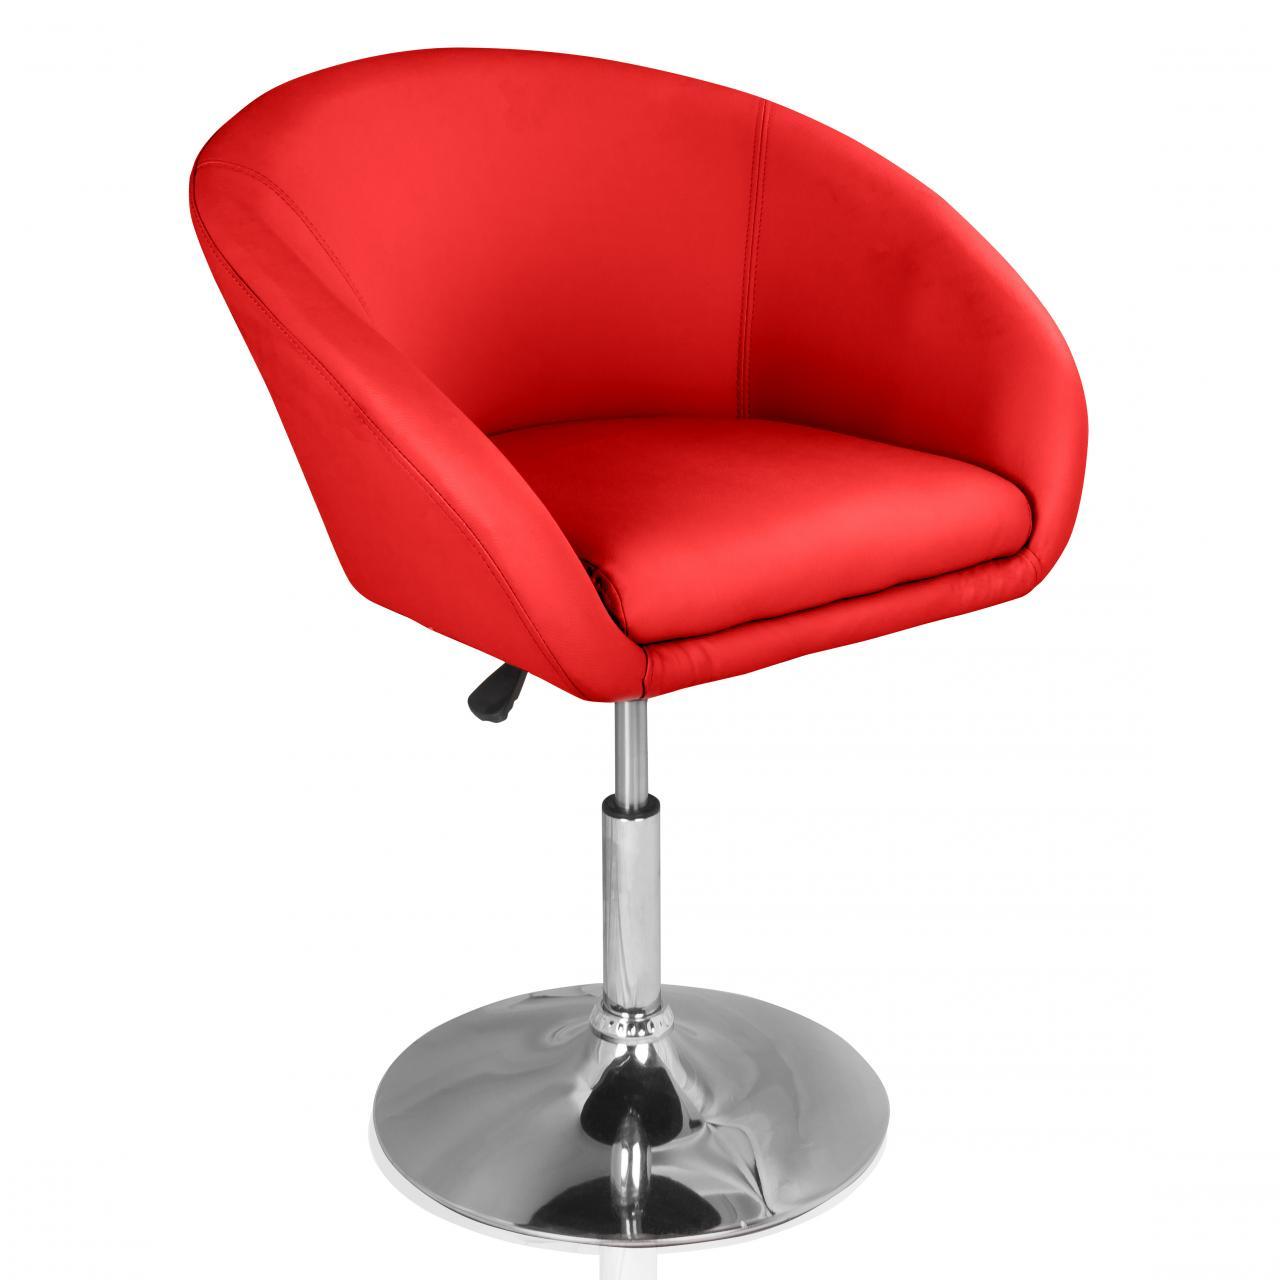 Bar Stool Faux Leather Office Chair Kitchen Breakfast  : LGCROT01 from www.ebay.co.uk size 1280 x 1280 jpeg 62kB